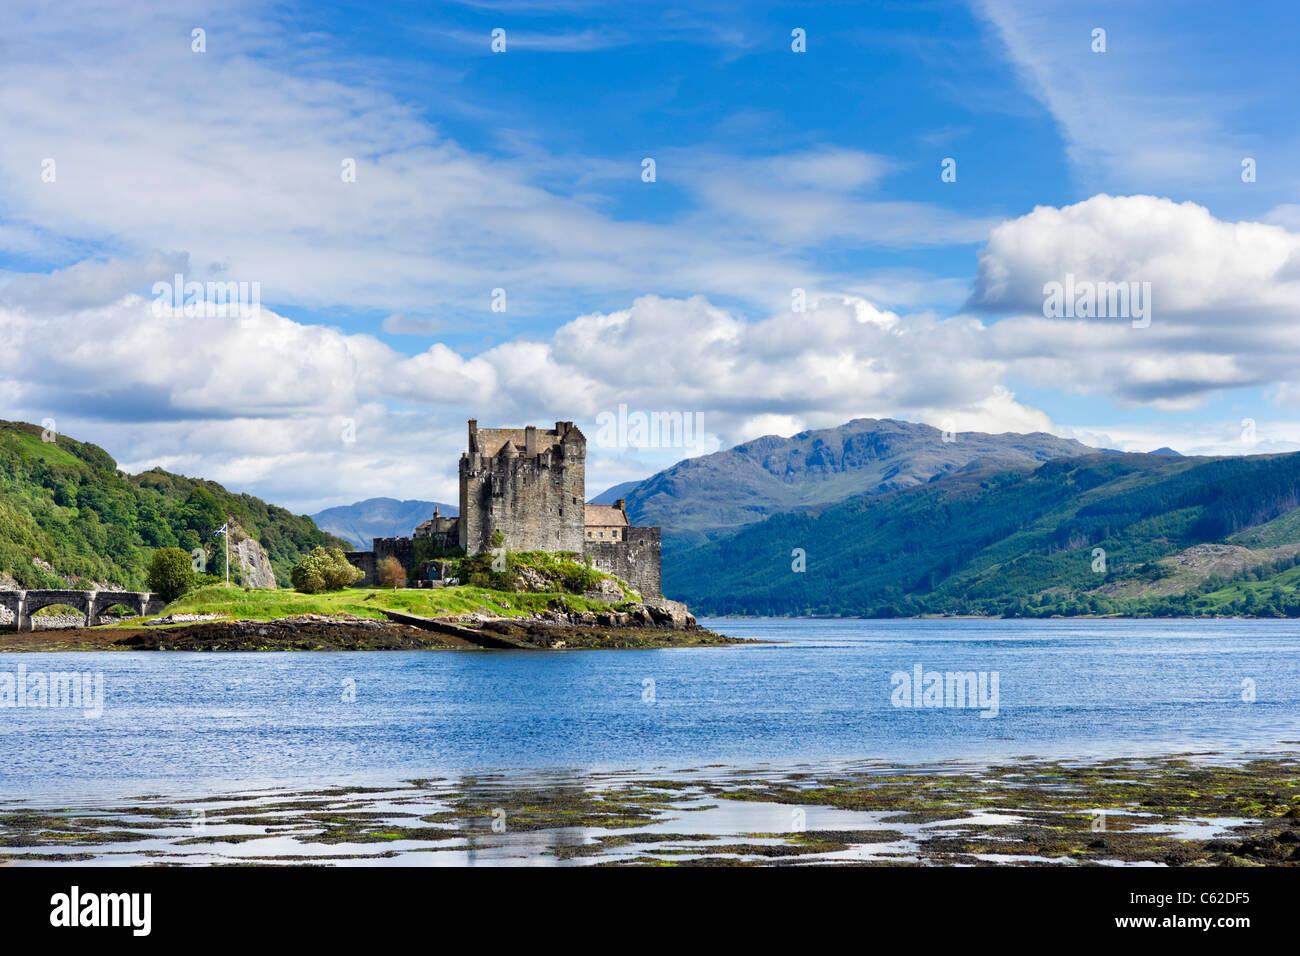 View towards Eilean Donan Castle, Loch Duich, Highland, Scotland, UK - Stock Image